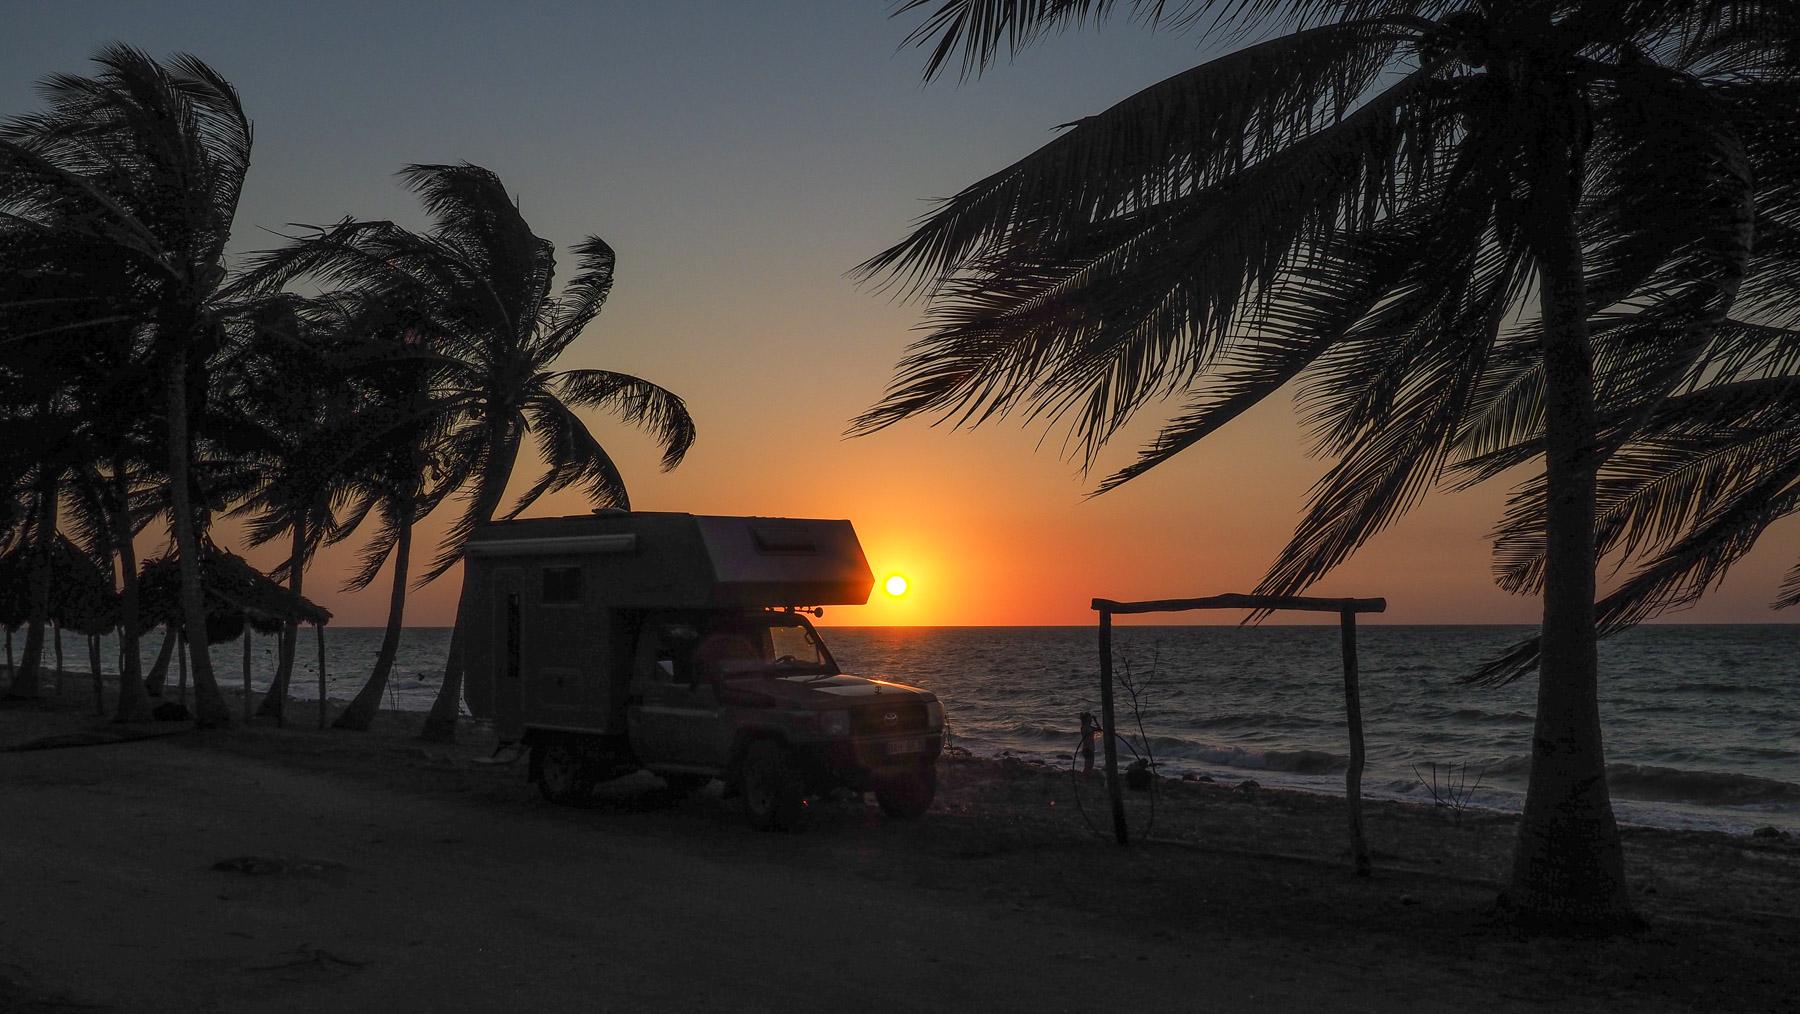 Sonnenuntergang an der Playa de Lorenzo